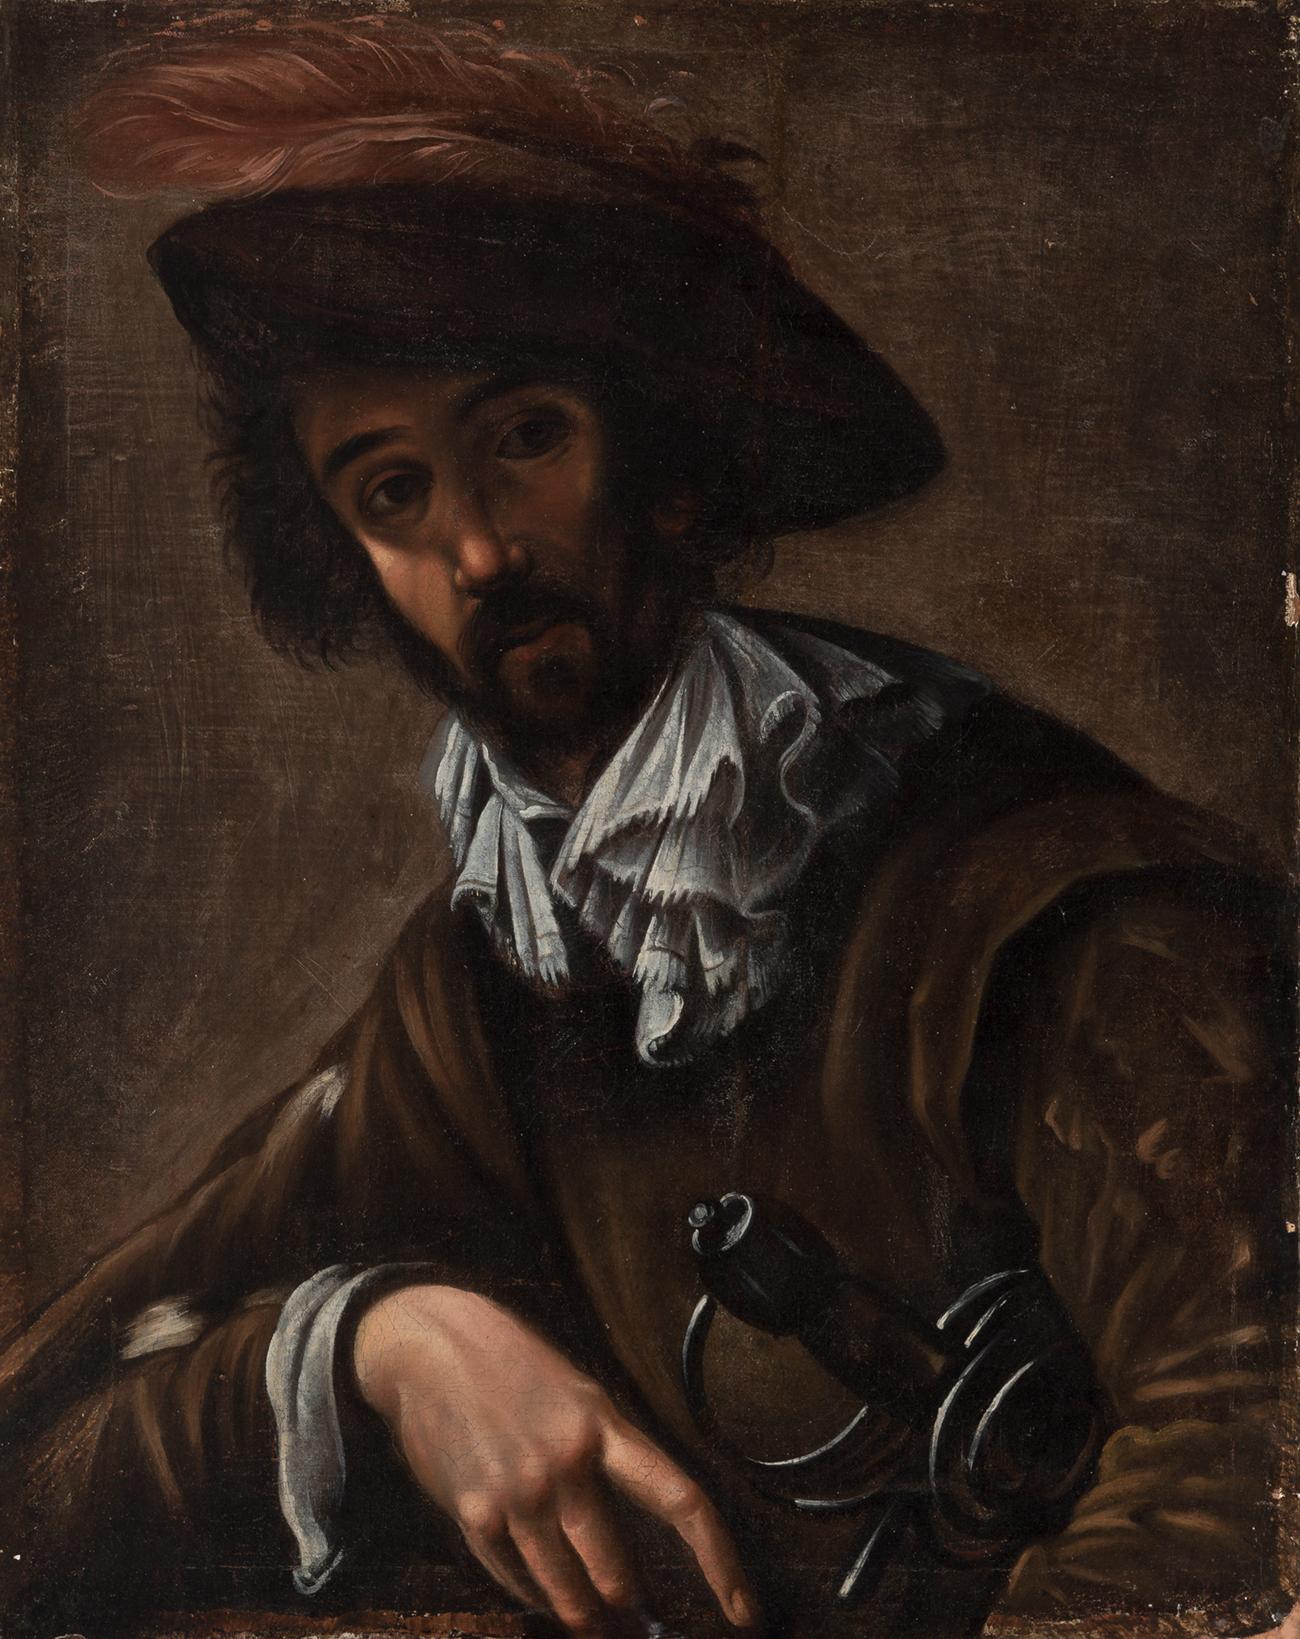 Escuela francesa, finales siglo XVII.Oleo sobre lienzo.